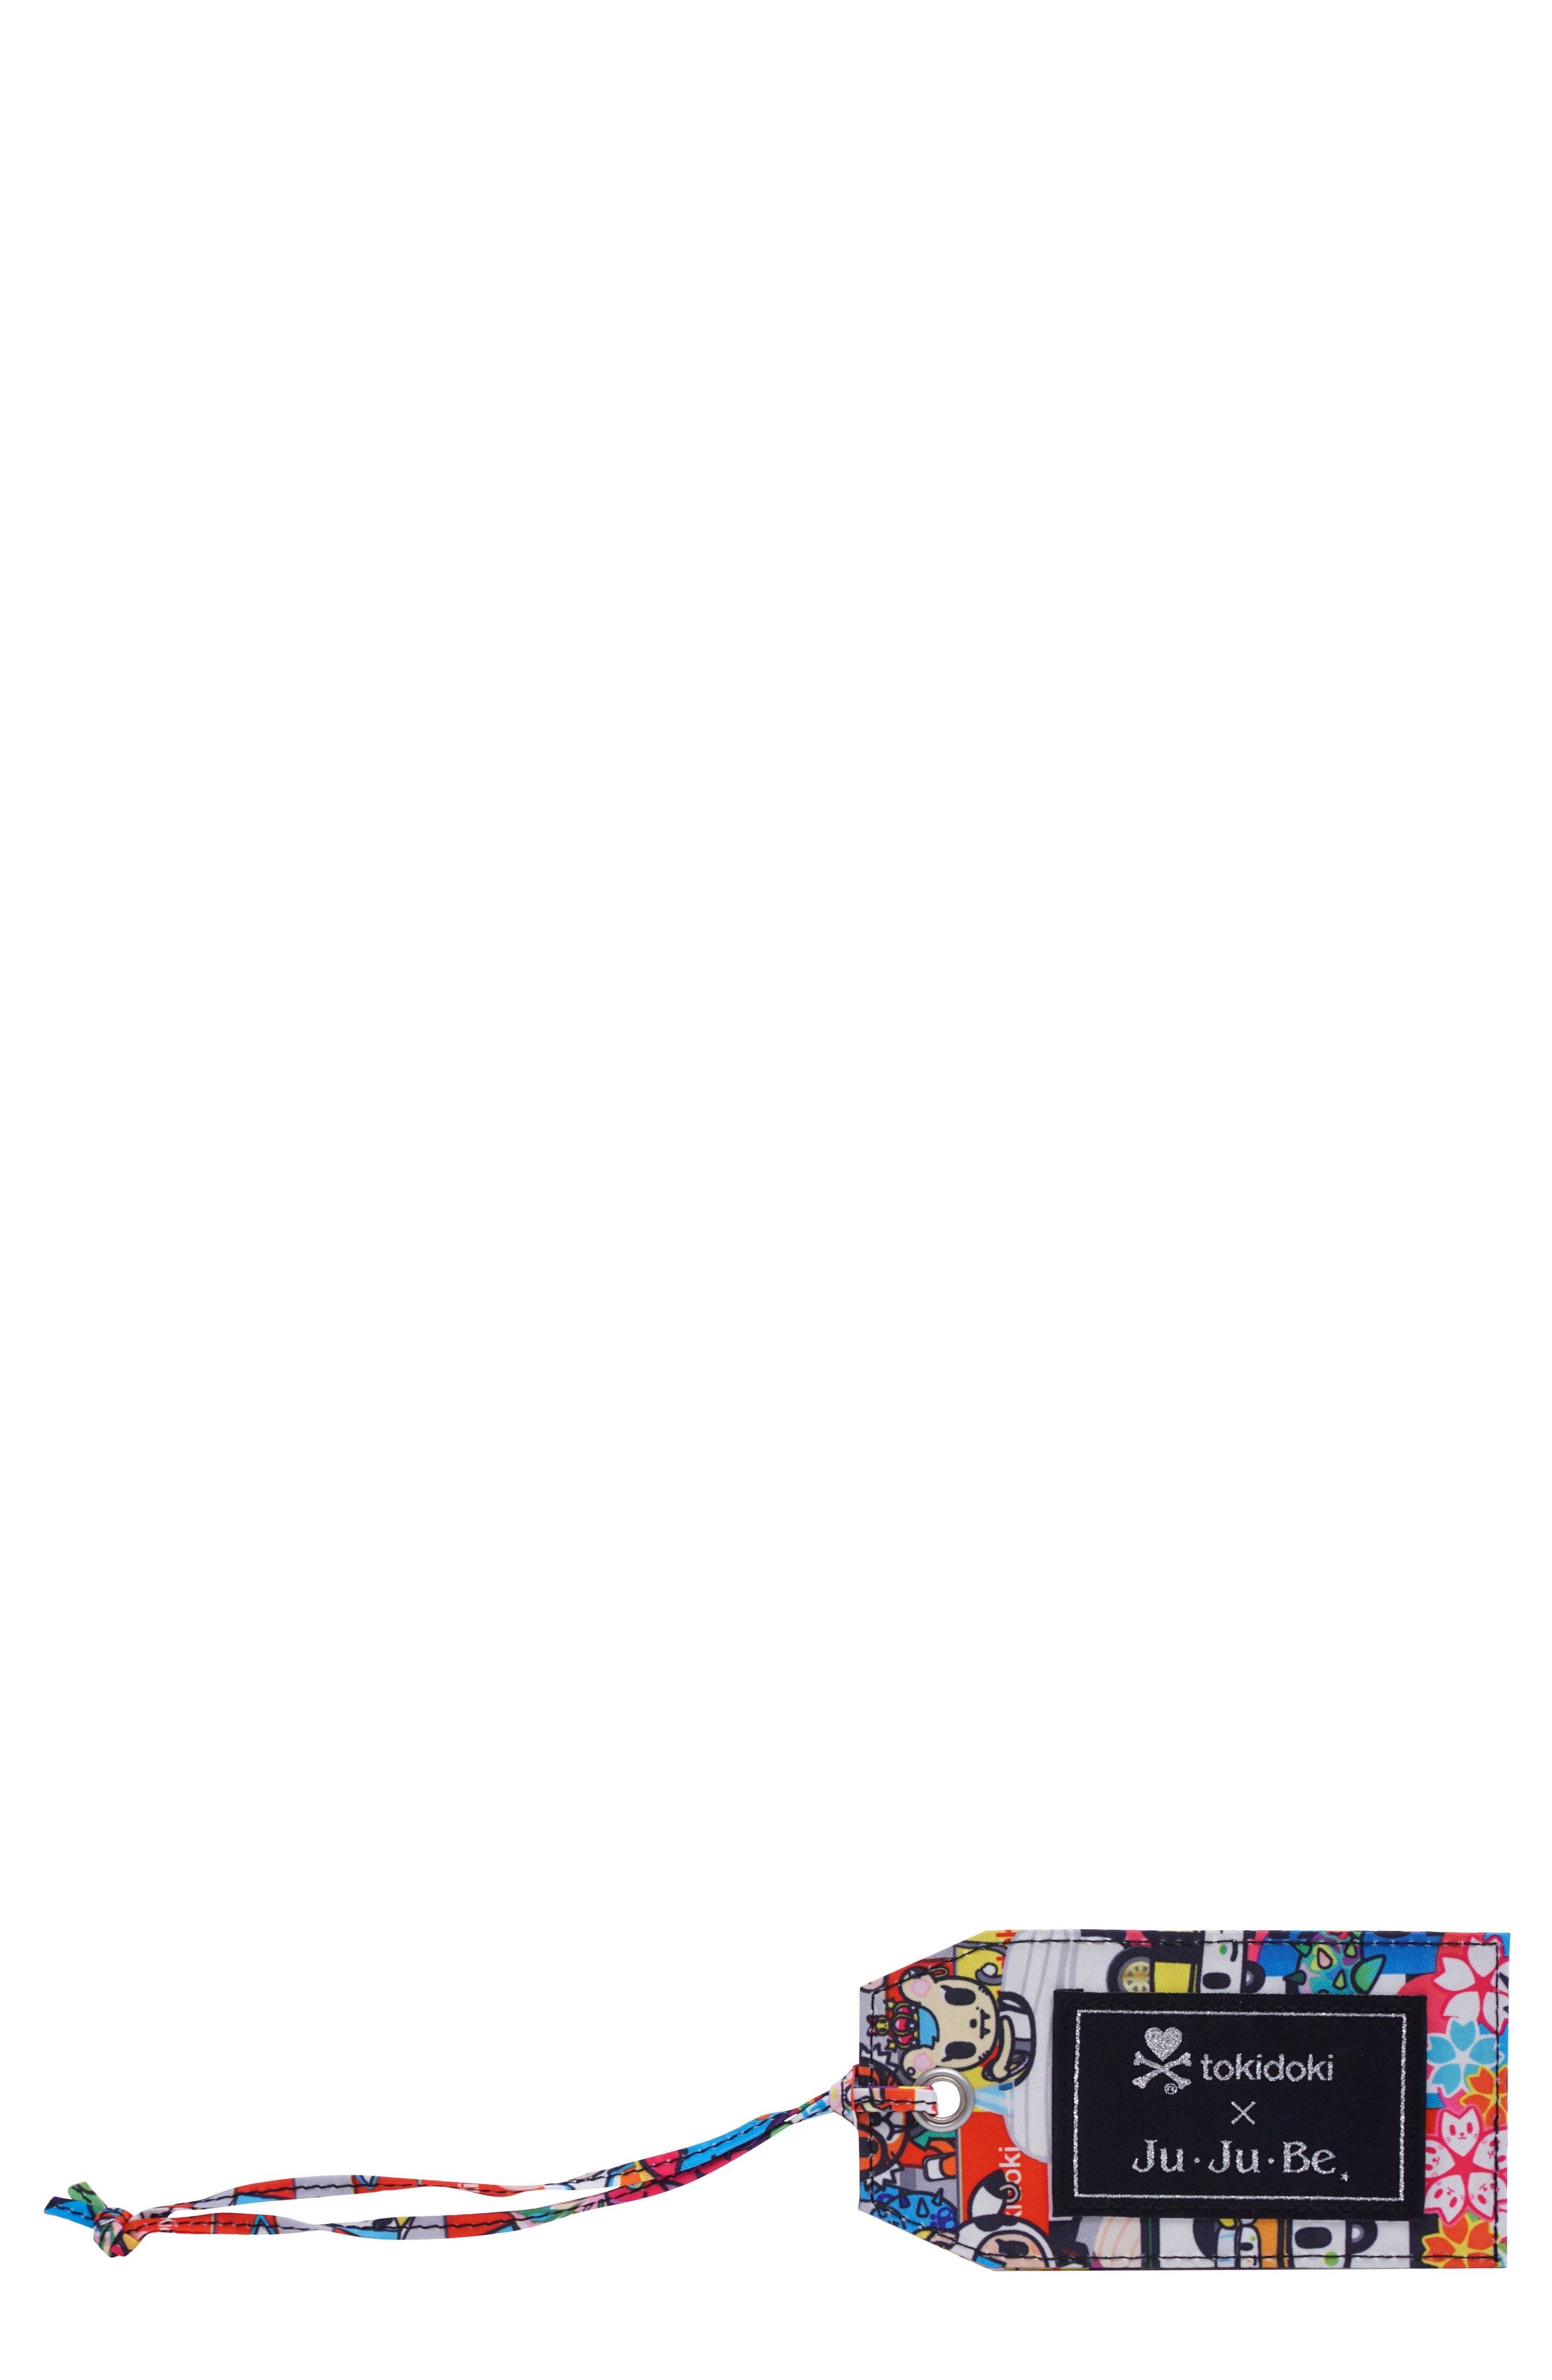 Alternate Image 1 Selected - Ju-Ju-Be x tokidoki for Hello Sanrio Rainbow Dreams Be Tagged Luggage Tag